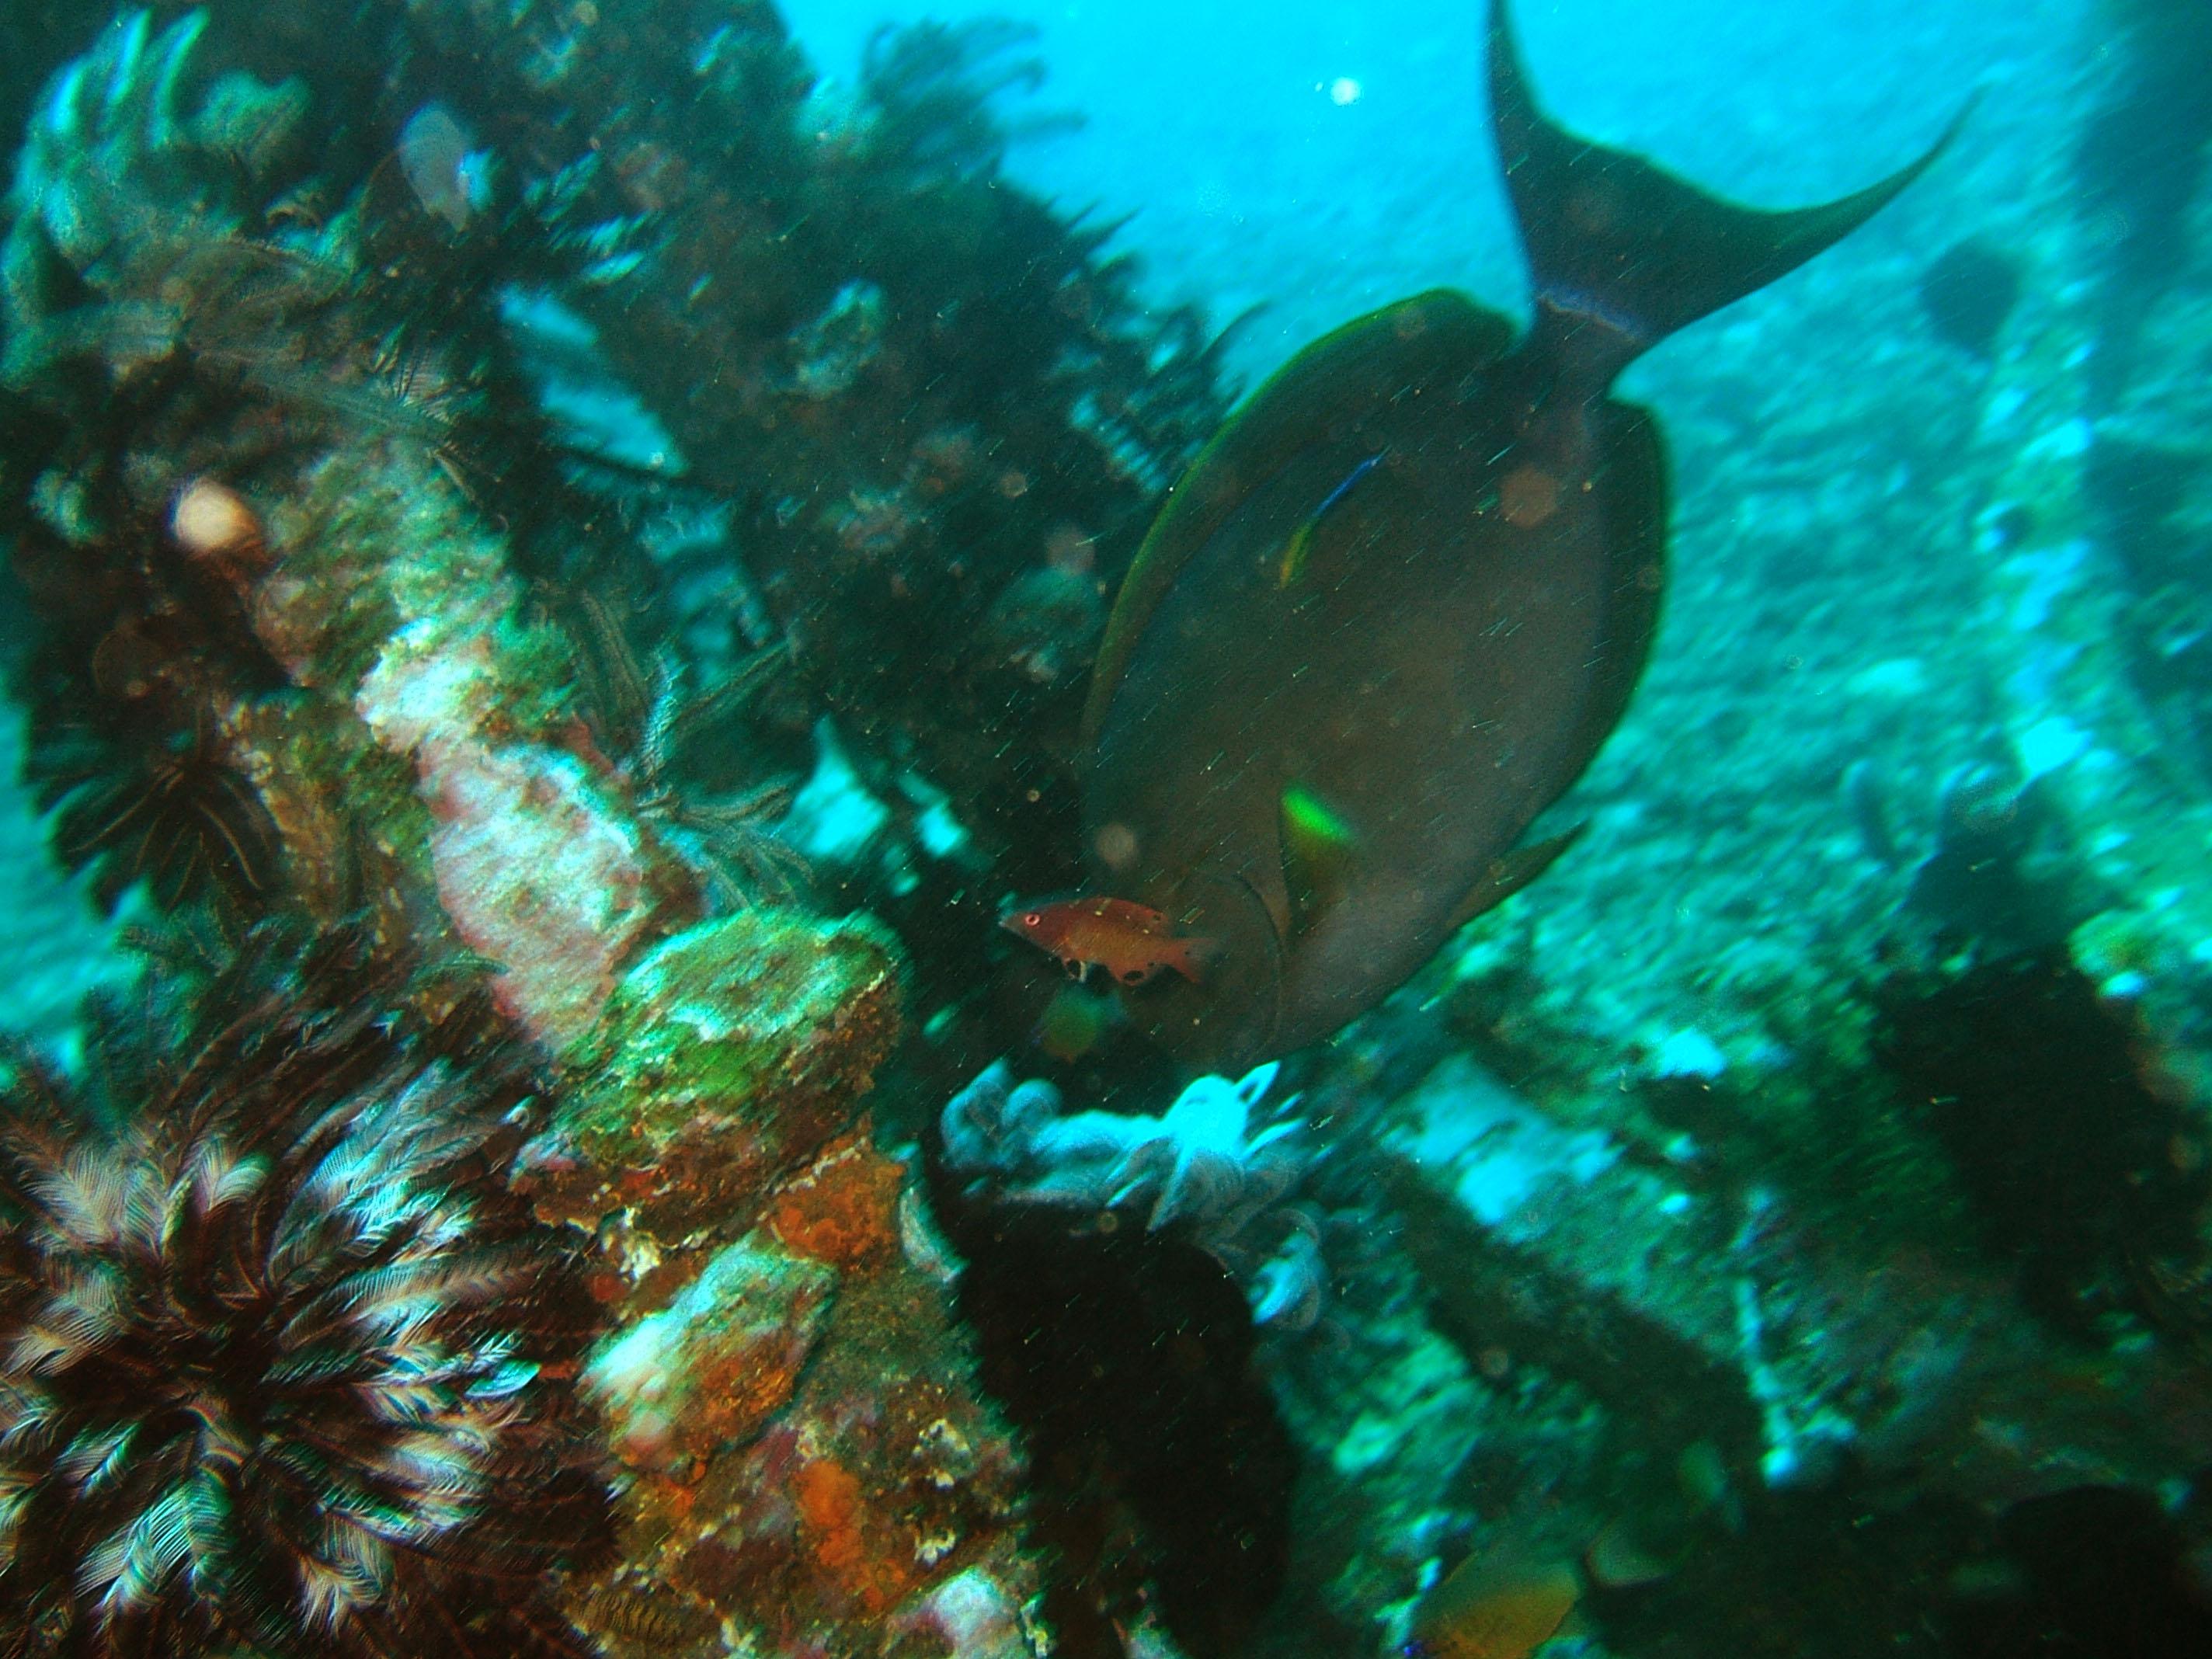 Dive 8 Philippines Mindoro Sabang Elma Jane wreck Oct 2005 19